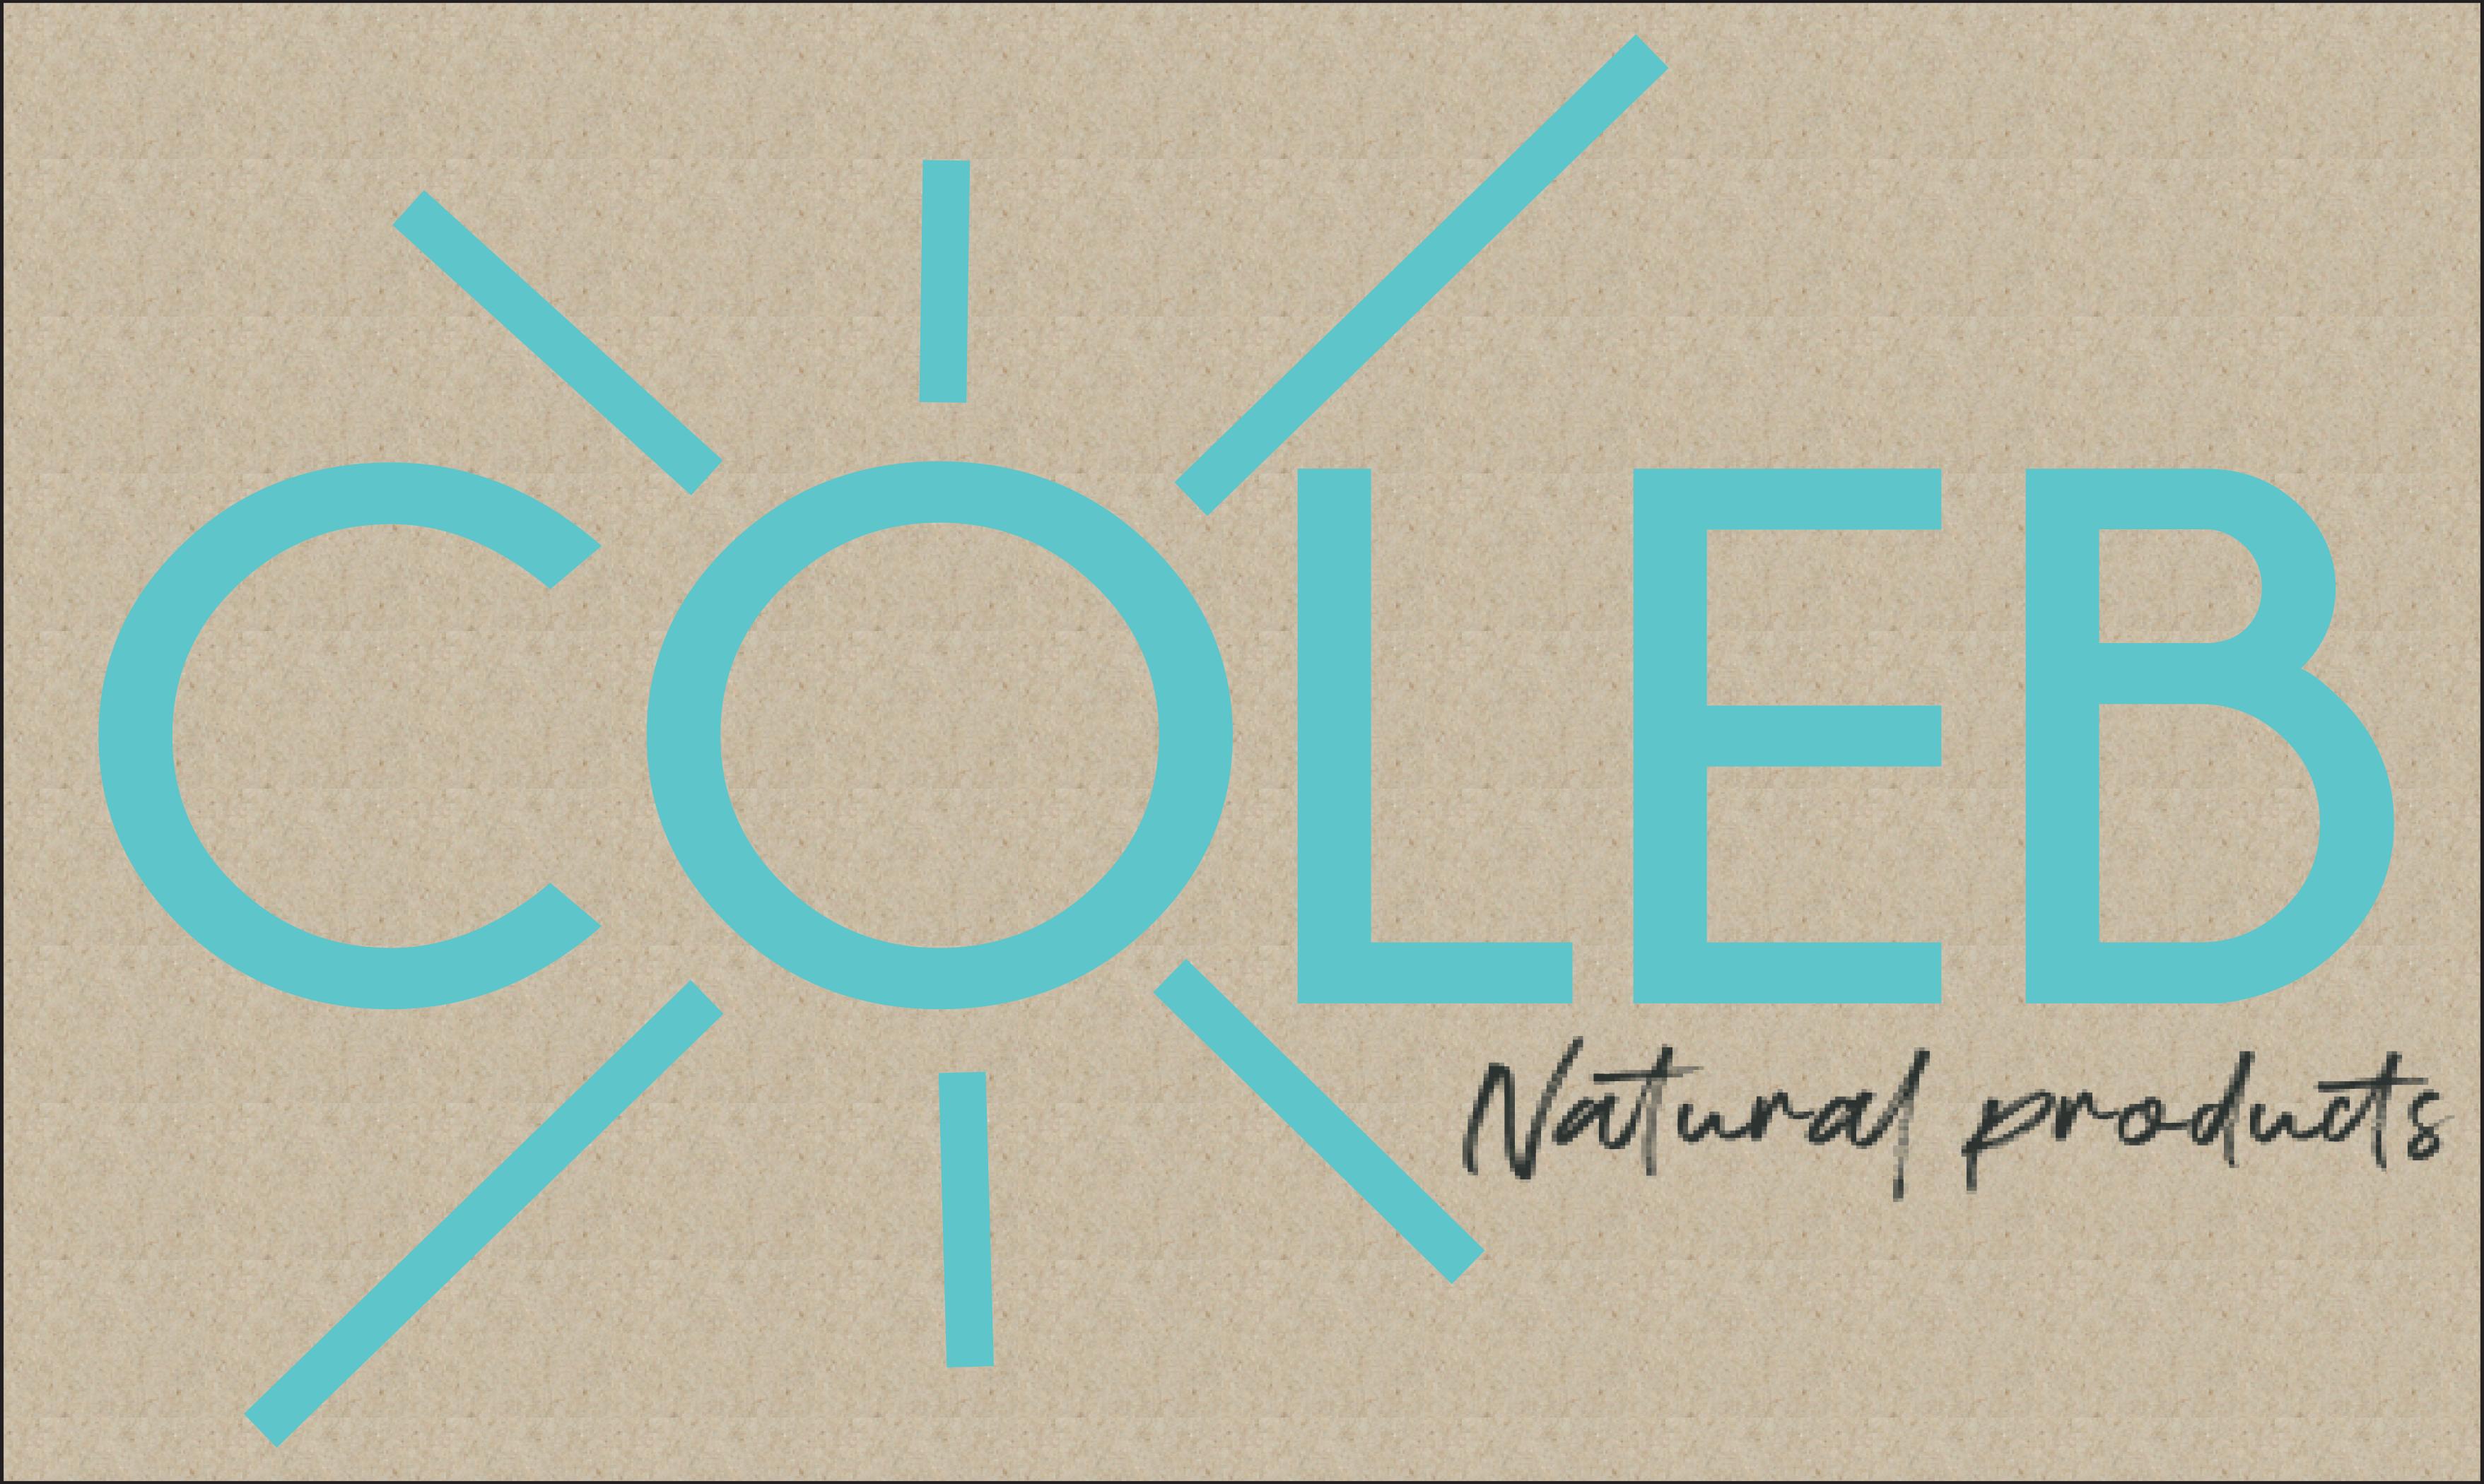 COLEBio produits naturels